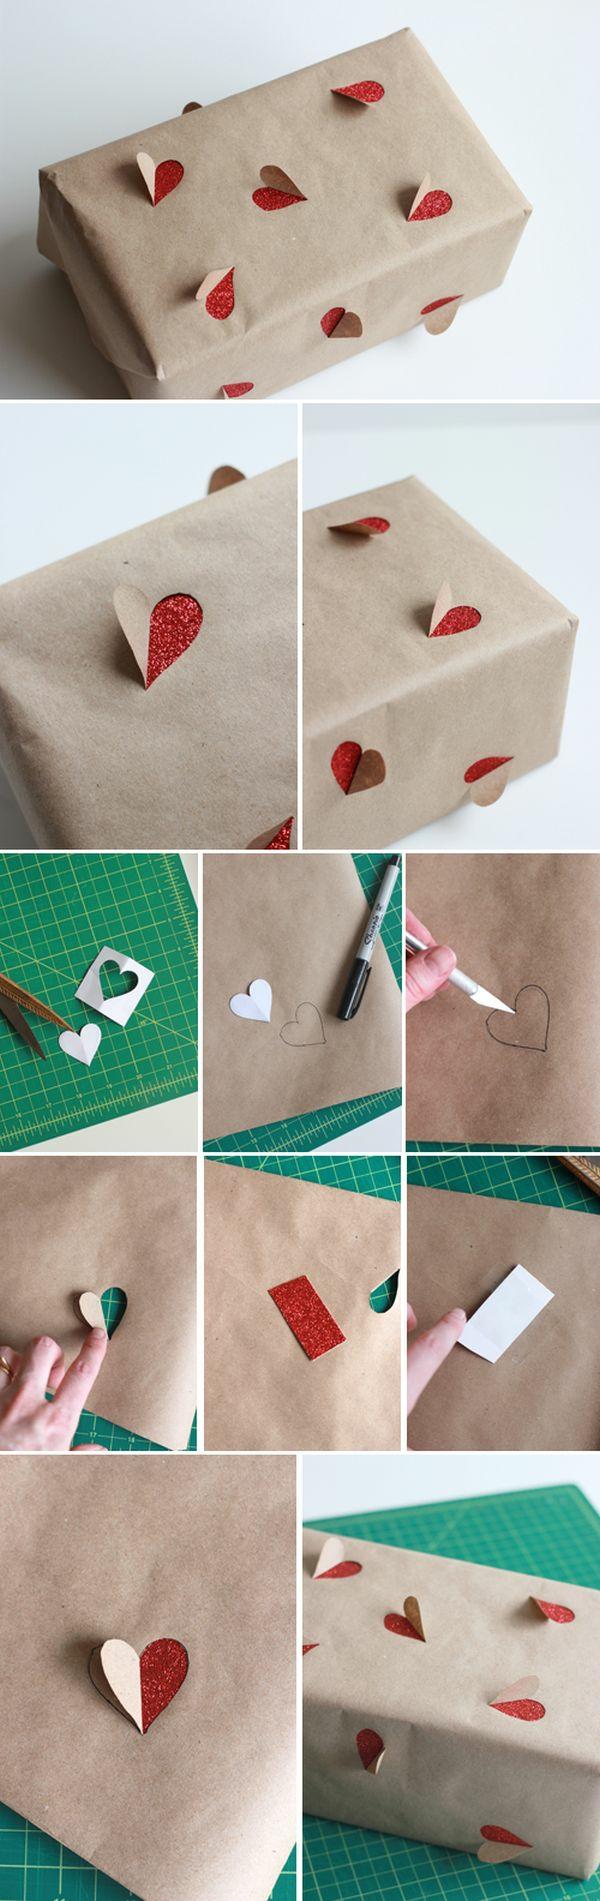 Woher kommt der Valentinstag geschichte geschenkideen verpackung